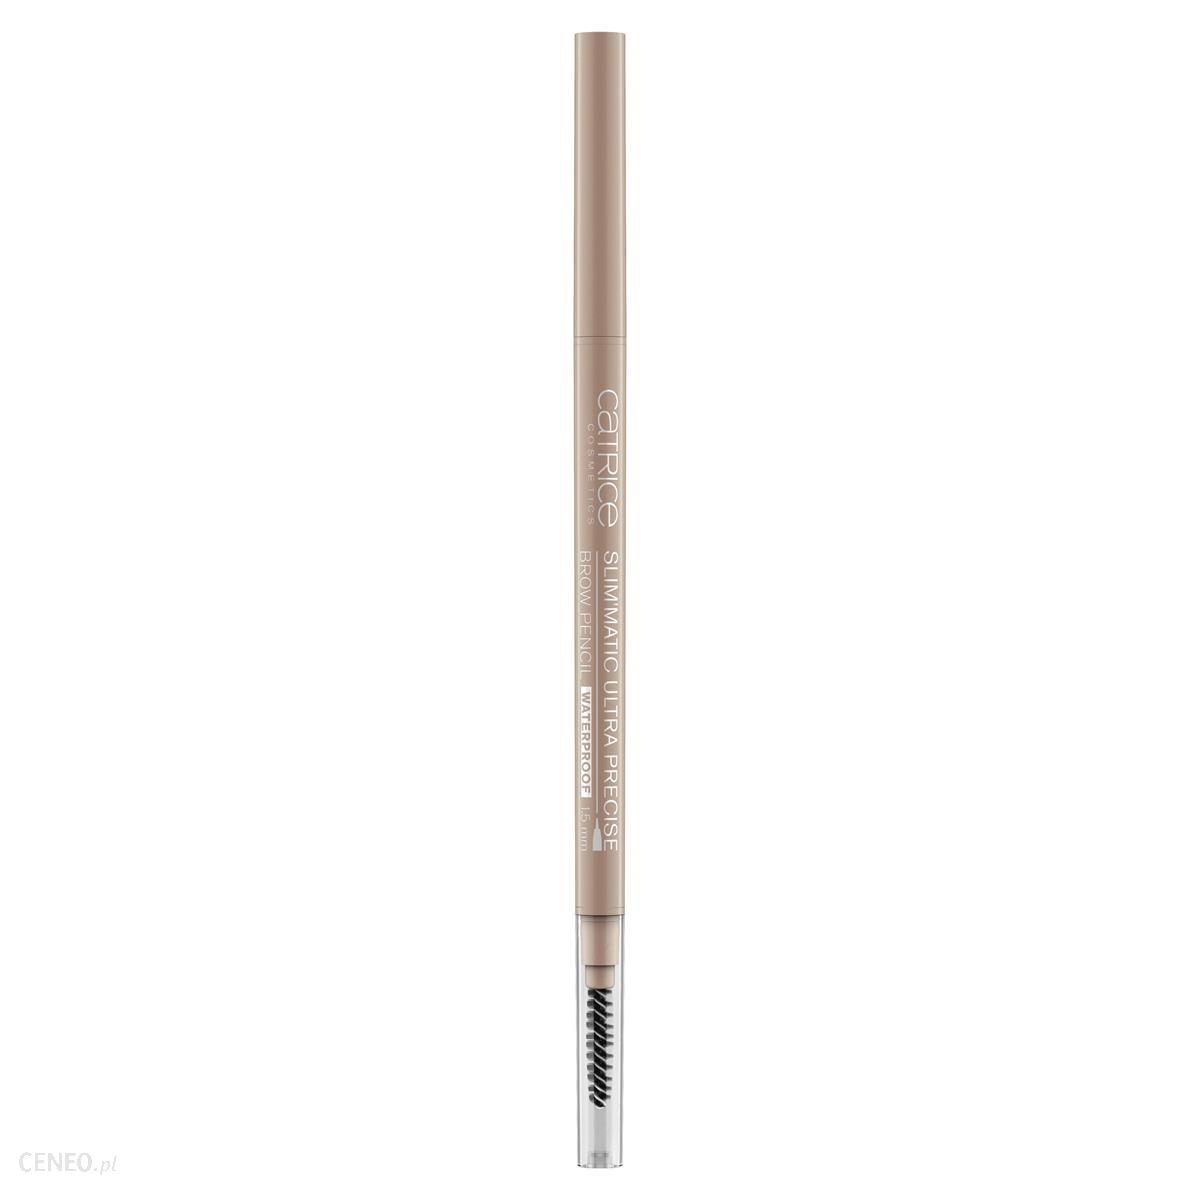 Catrice Slim'Matic Brow Pencil Wodoodporna Kredka Do Brwi 015 Ash Blonde